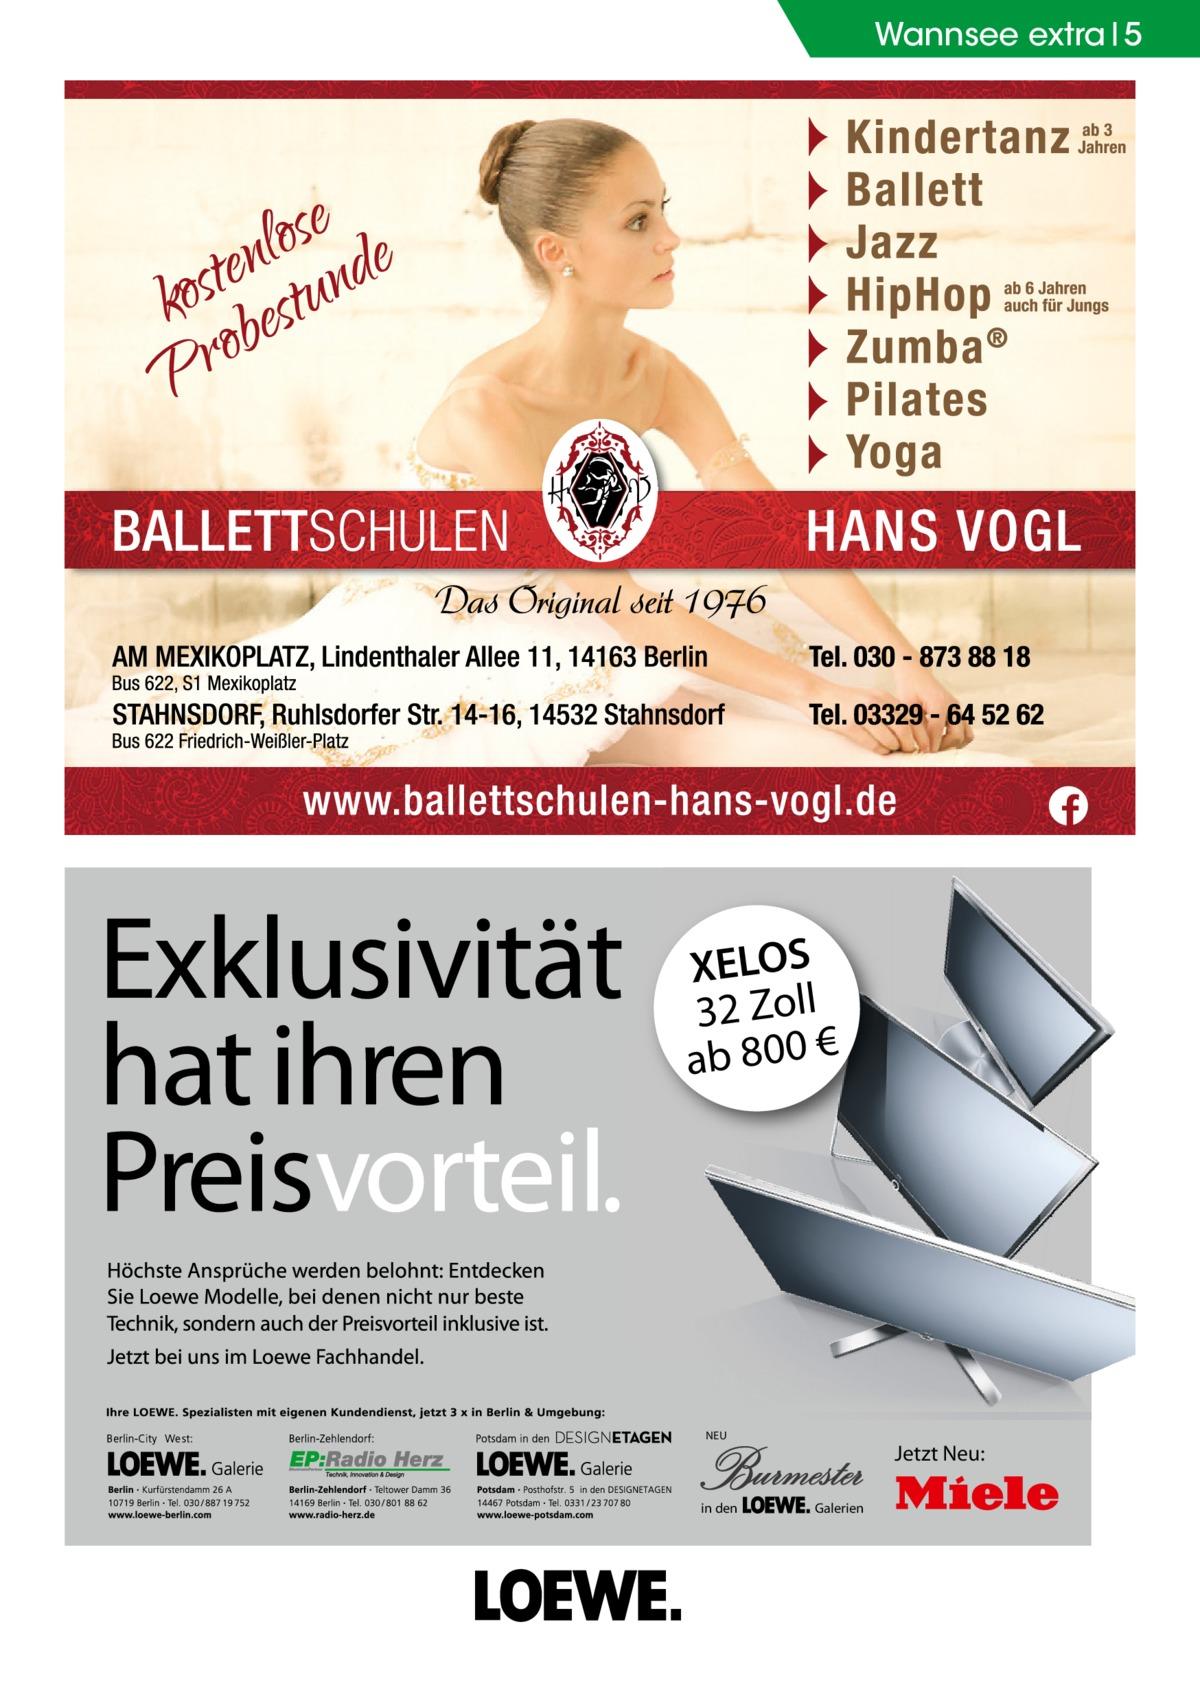 Wannsee extra 5  XELOS 32 Zoll ab 800 €  NEU  in den  Jetzt Neu: Galerien